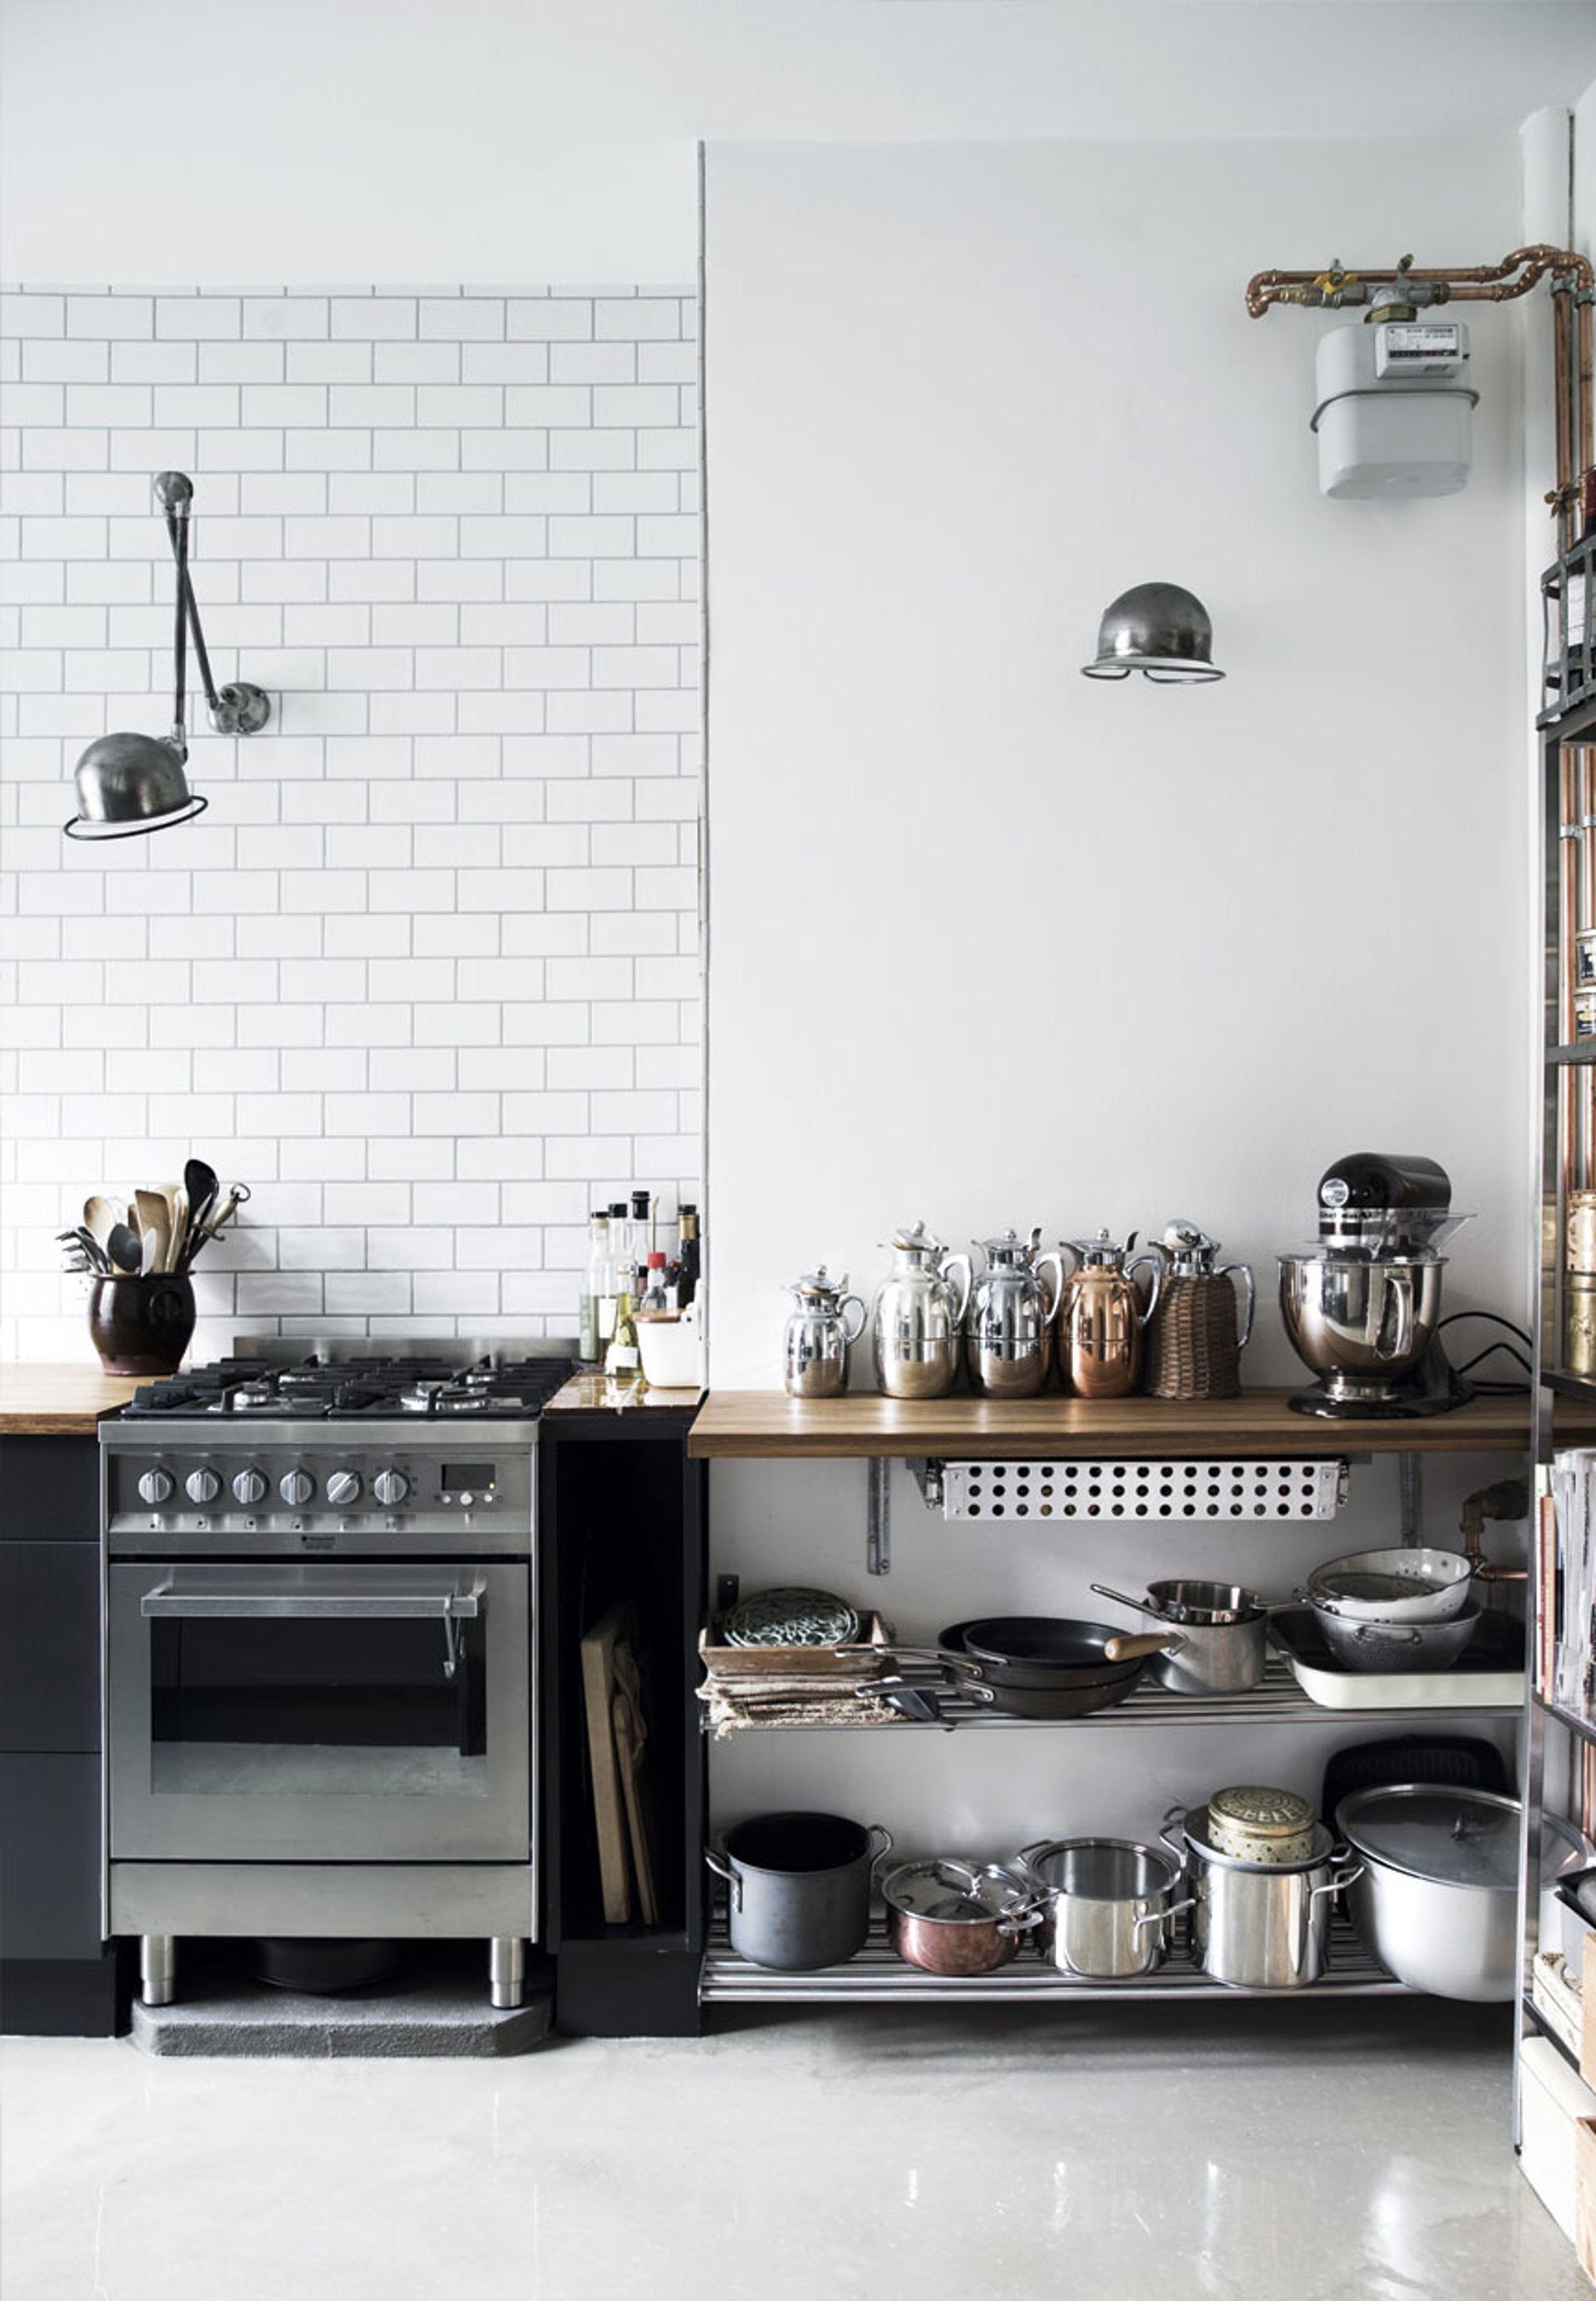 Industrielt k¸kken fra Kvänum Kitchens My style